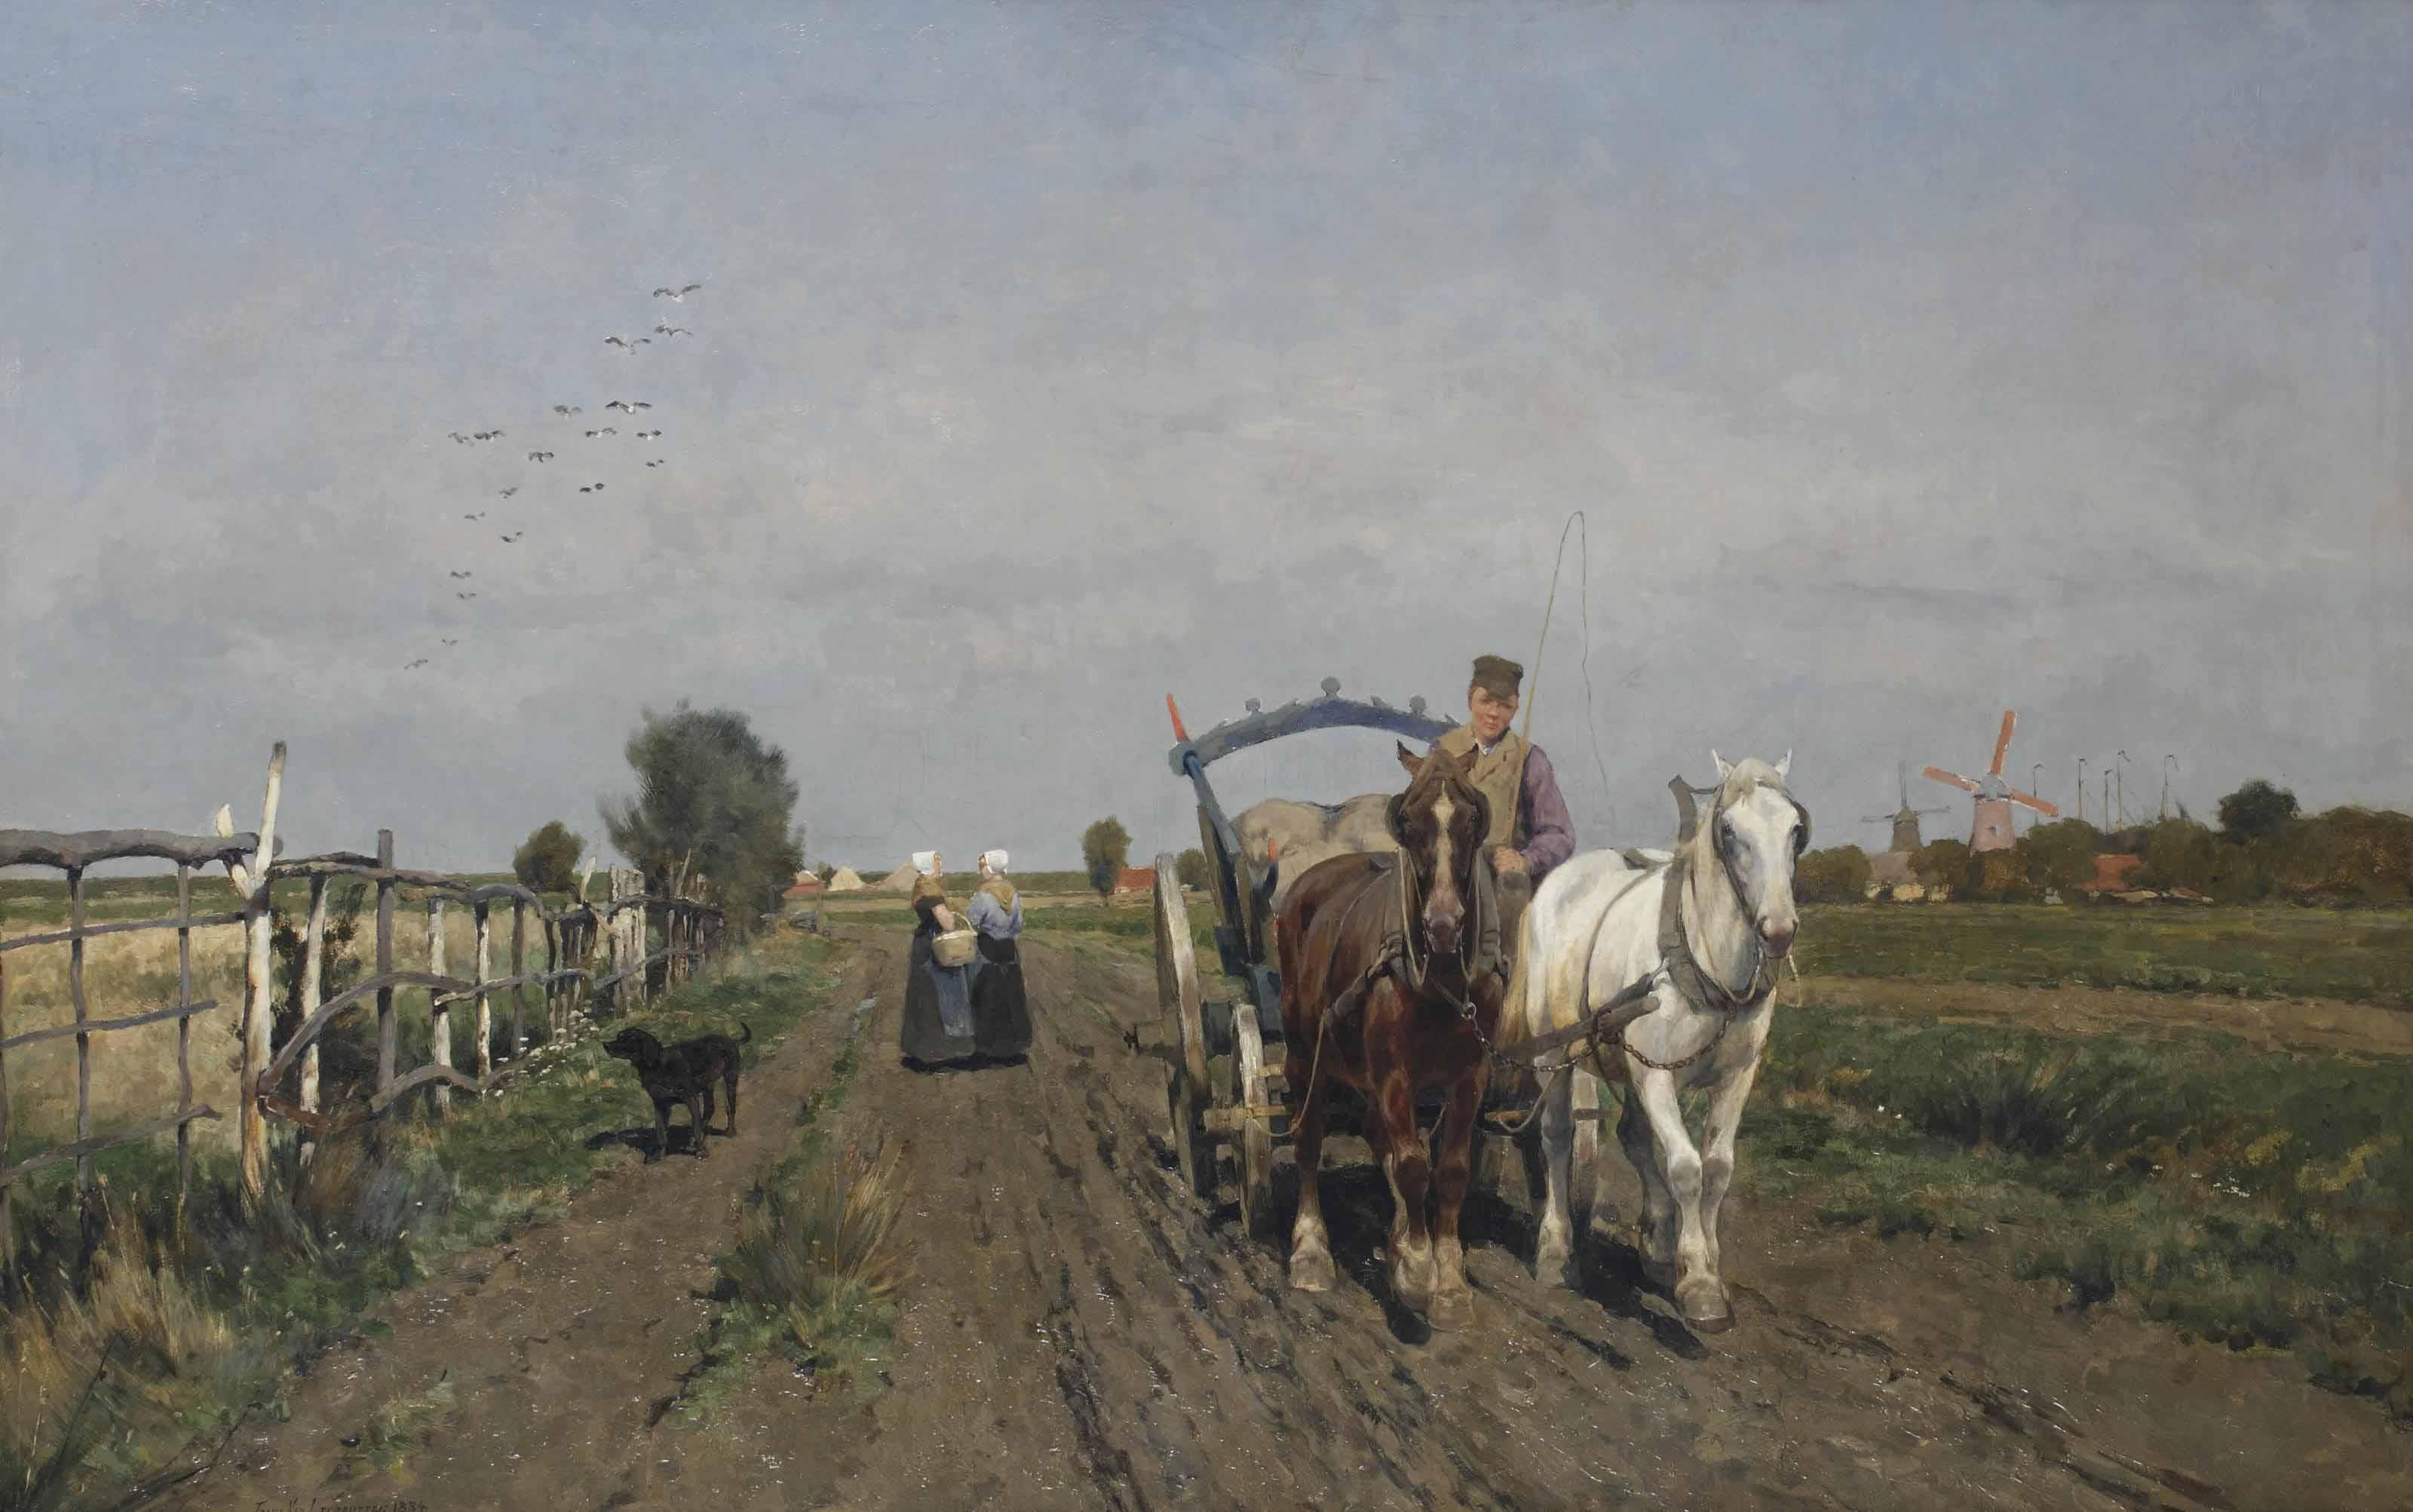 Horses on a path